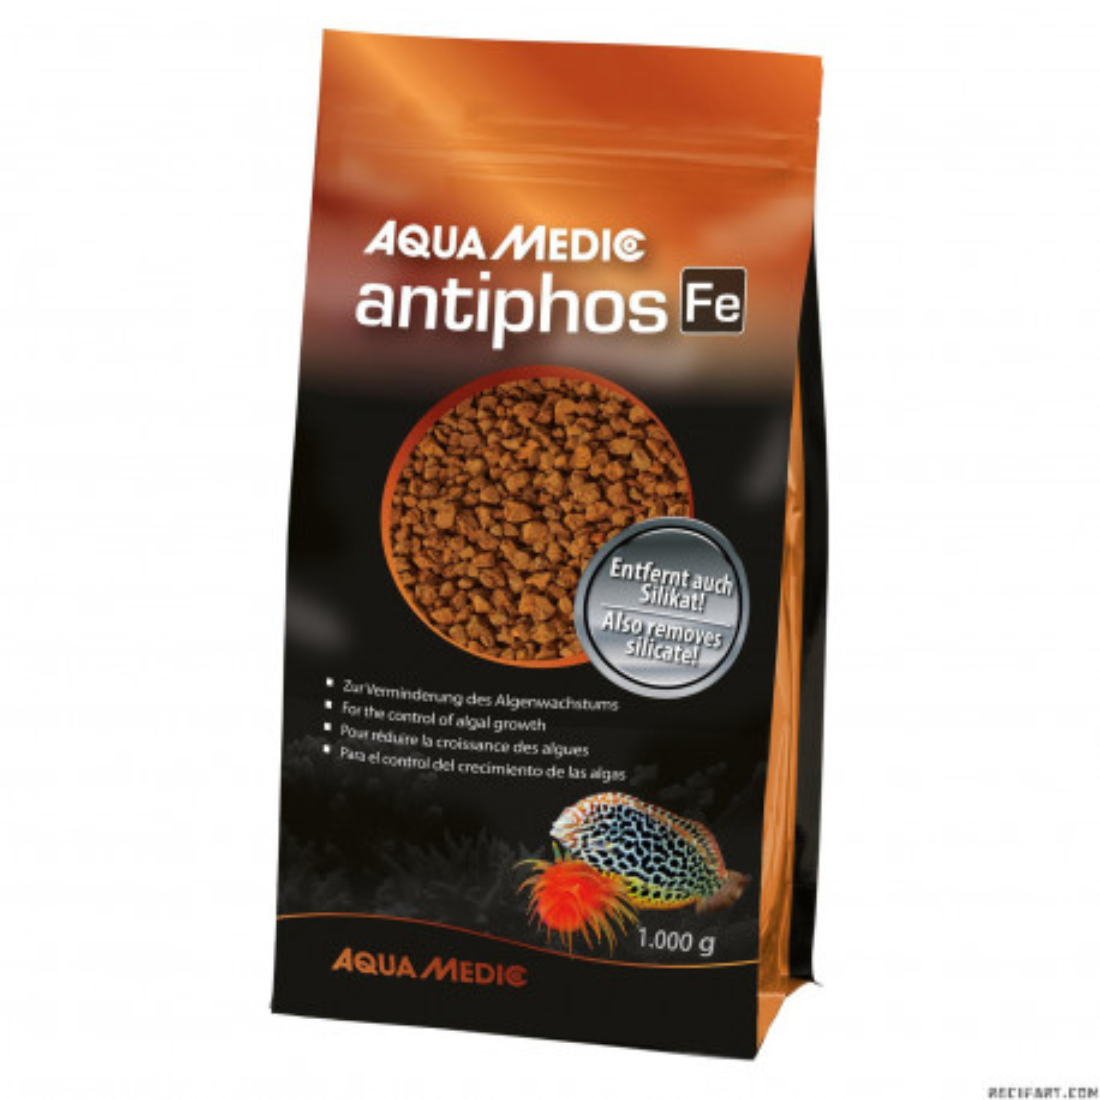 Aqua Medic Antiphos Fe 1000g